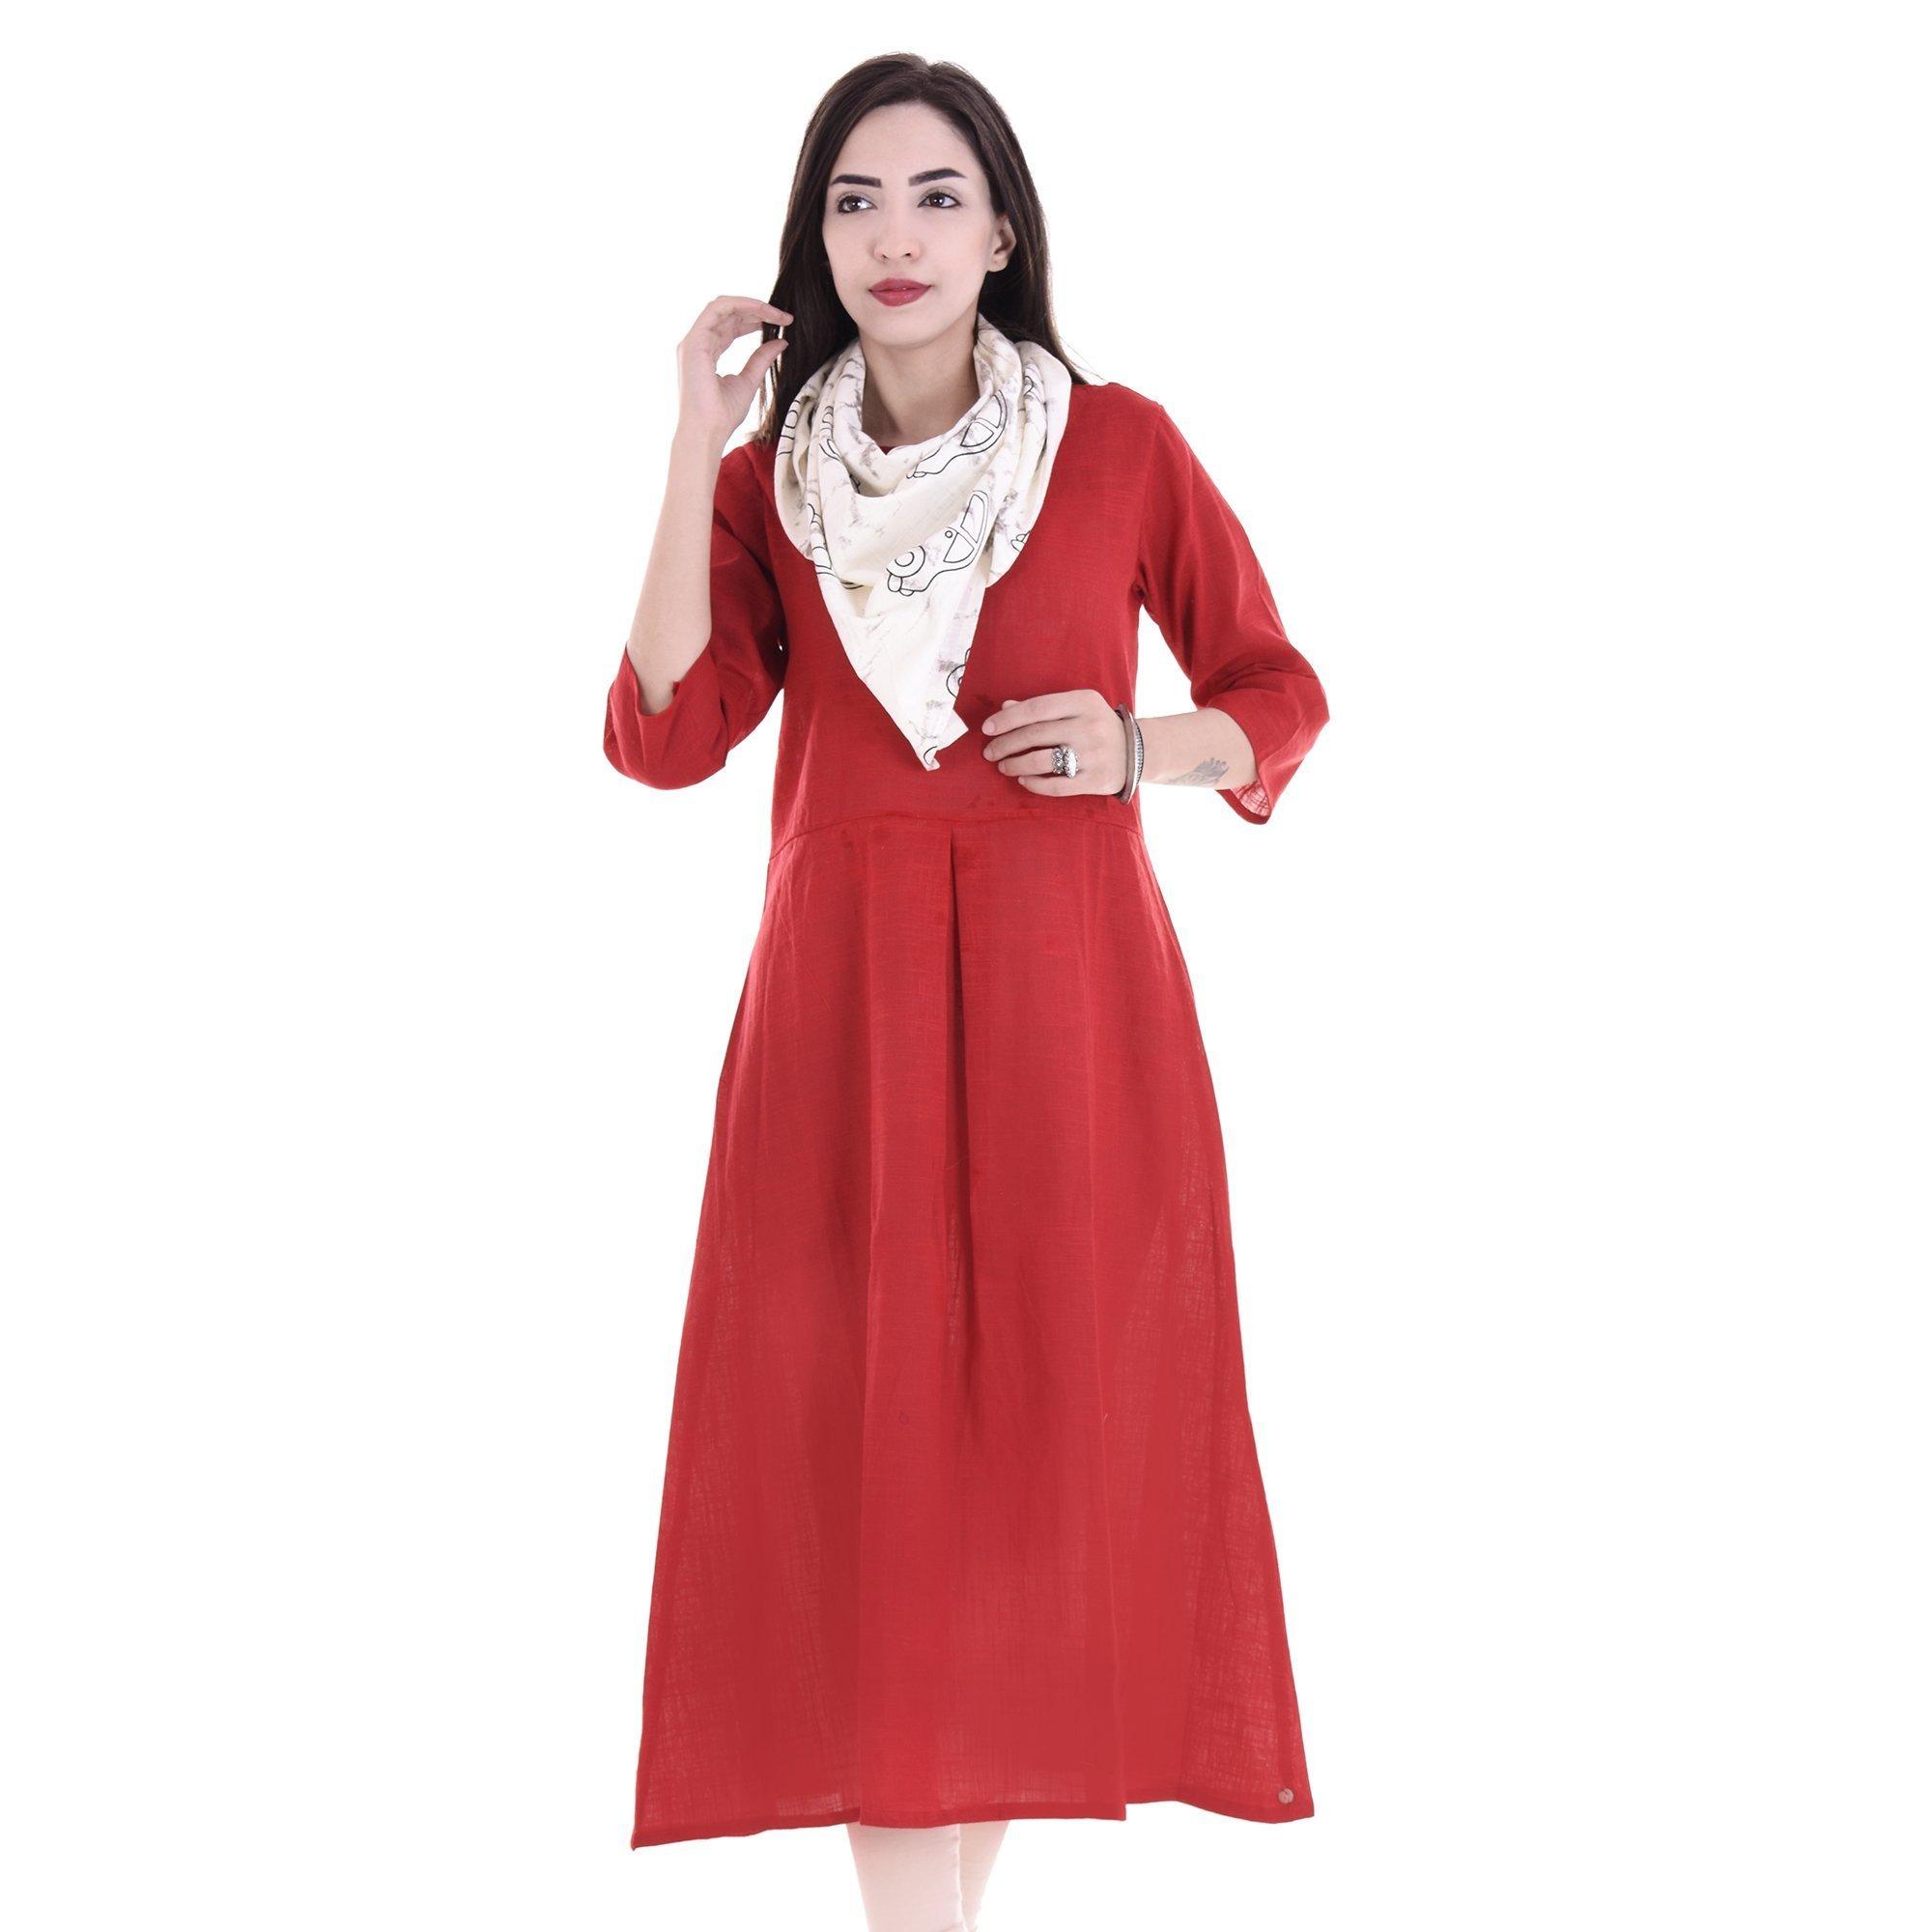 Chichi Indian Women Kurta Kurti 3/4 Sleeve X-Large Size Plain with Scarf Round Maroon Top